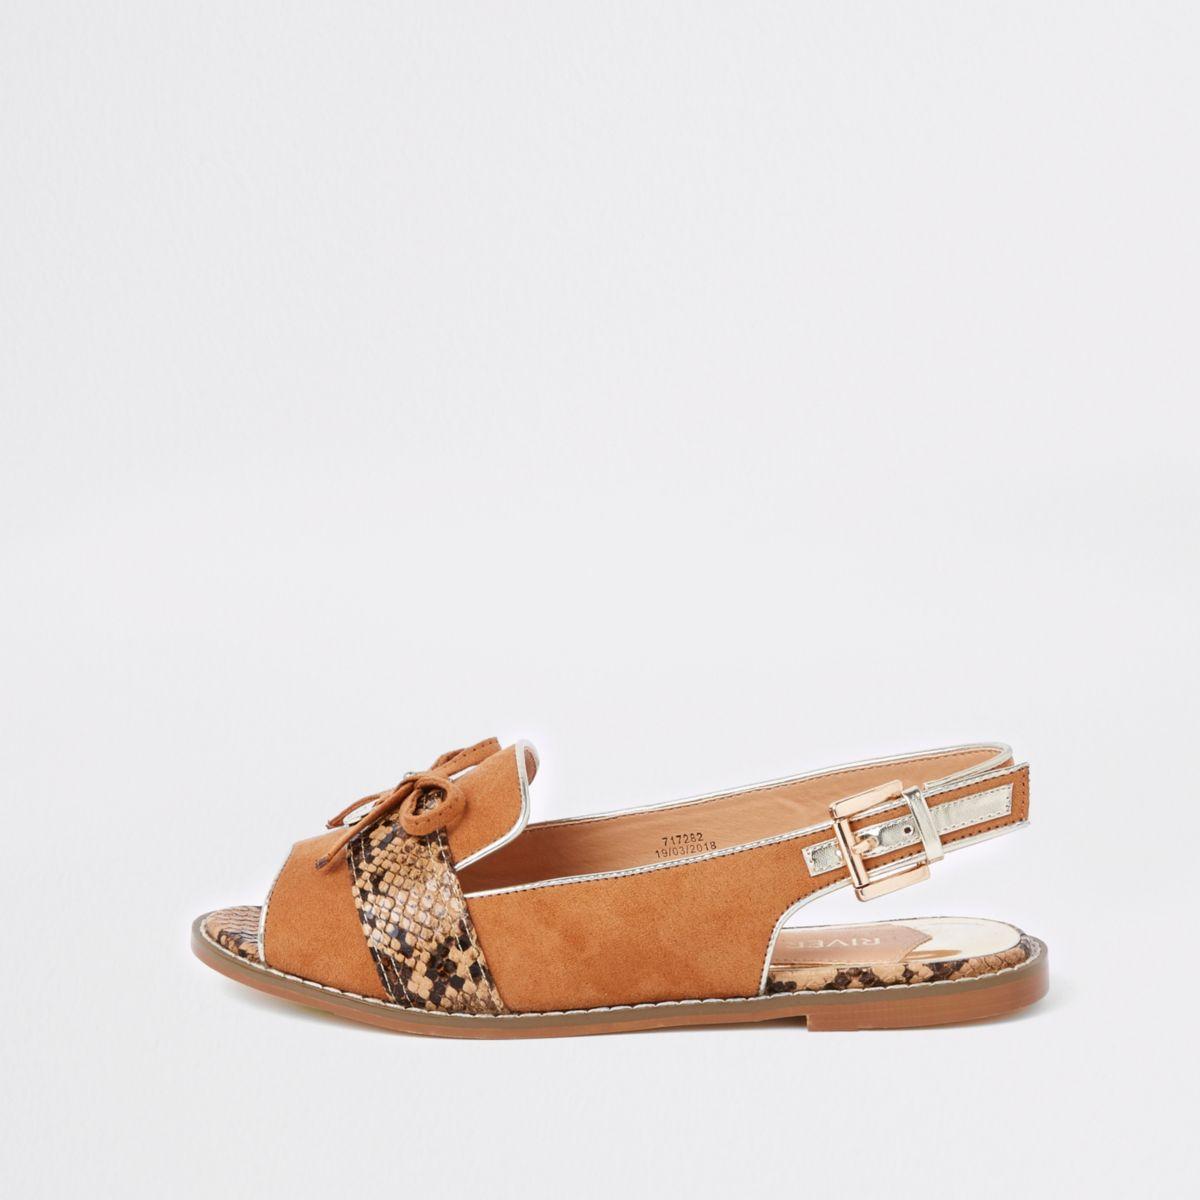 Bruine slingback loafers met brede pasvorm en slangenprint